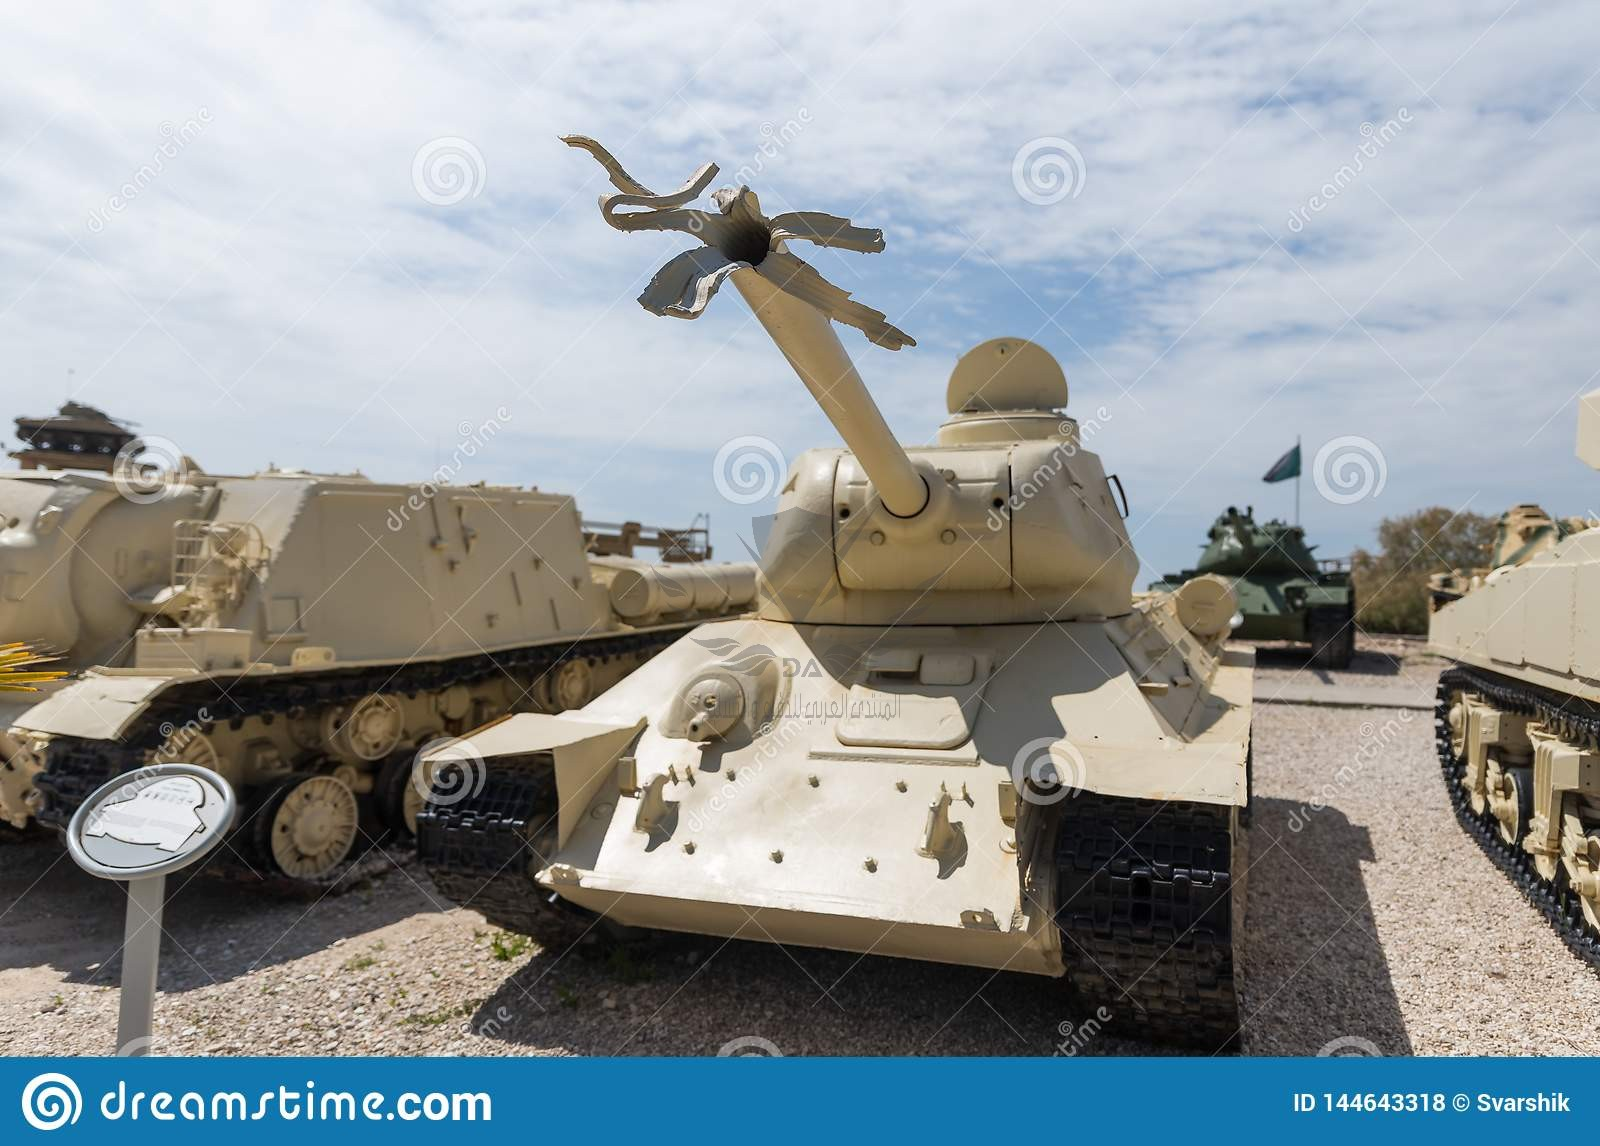 latrun-israel-april-tank-broken-barrel-shot-memorial-site-near-armored-corps-museum-144643318.jpg